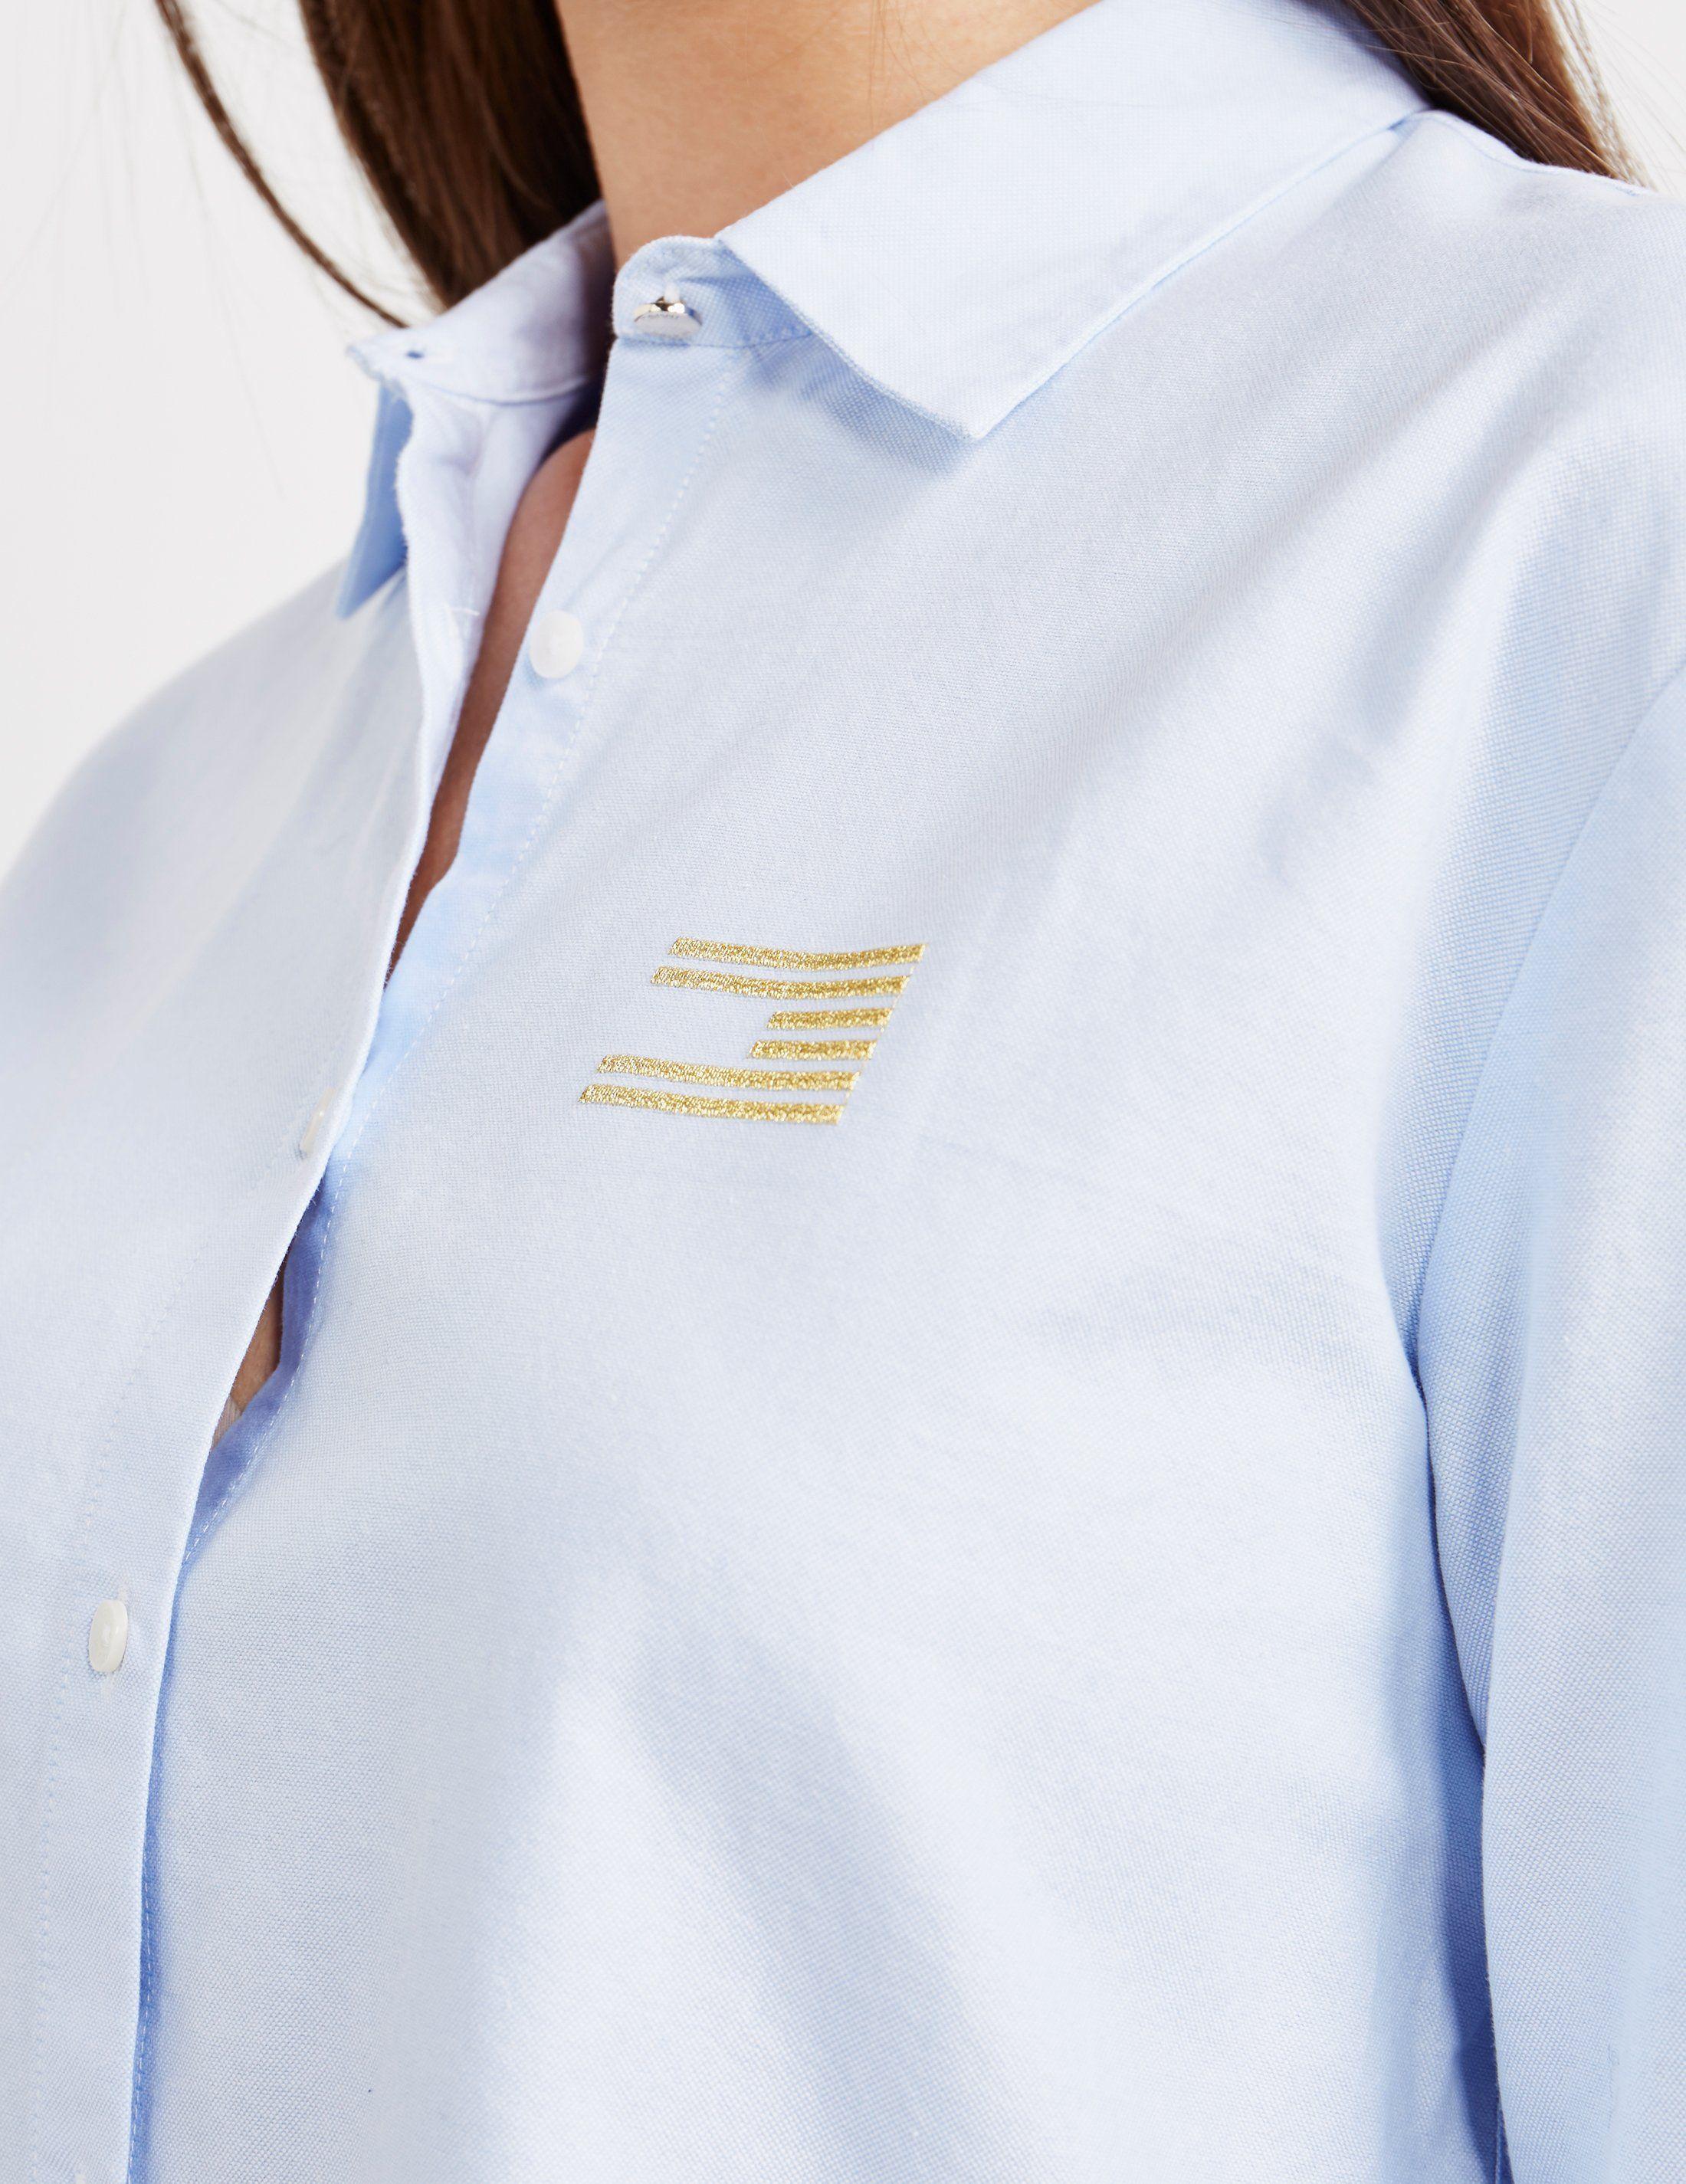 Tommy Hilfiger Girlfriend Long Sleeve Shirt - Online Exclusive